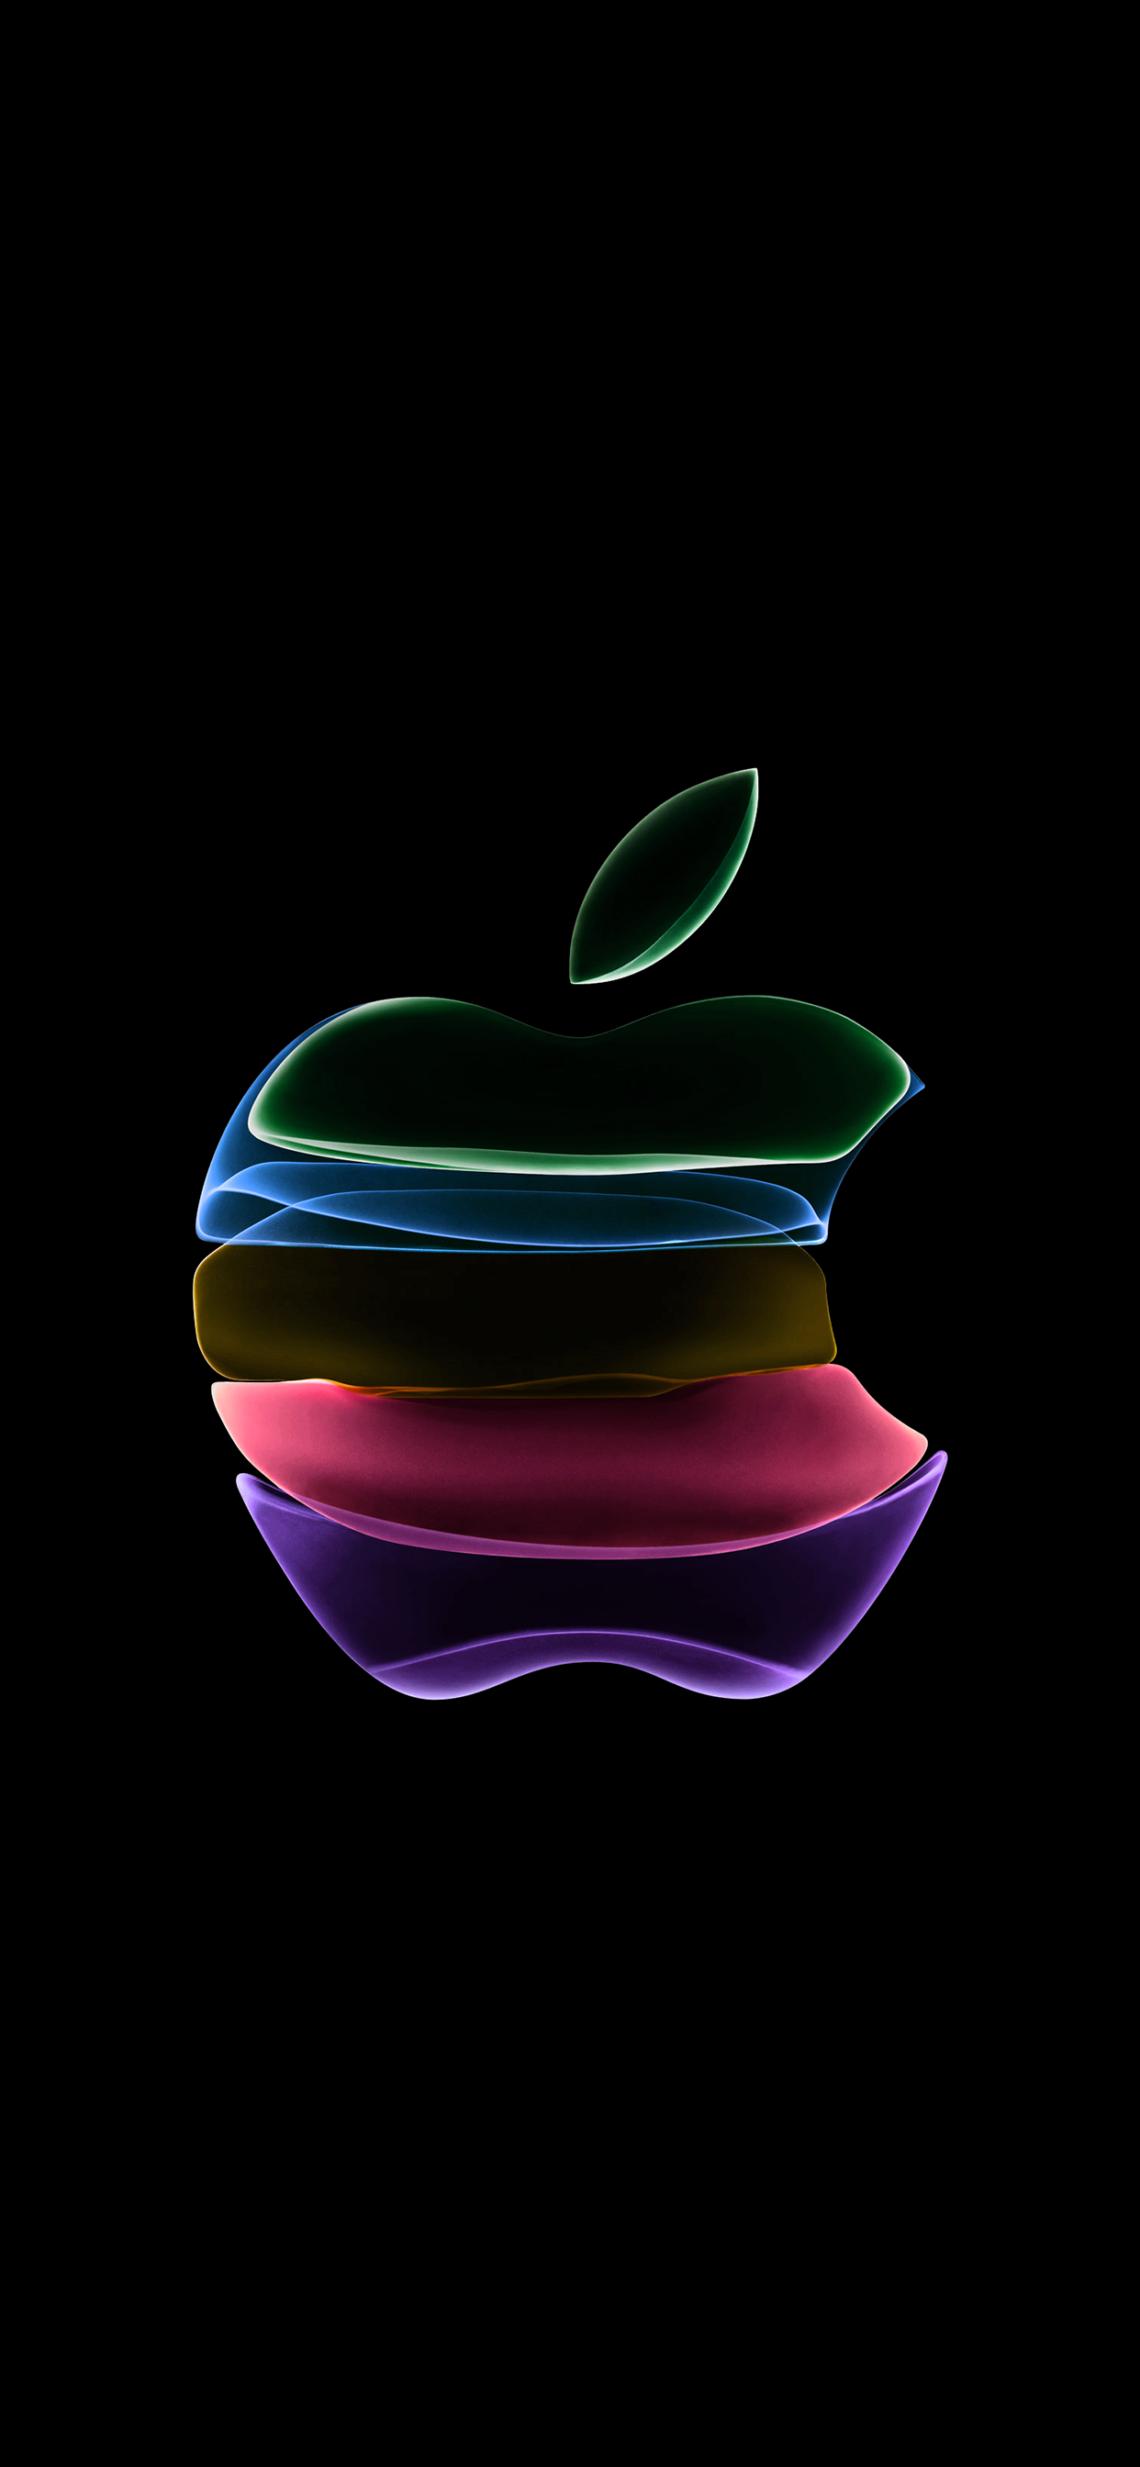 Apple logo wallpaper iphone, Iphone ...